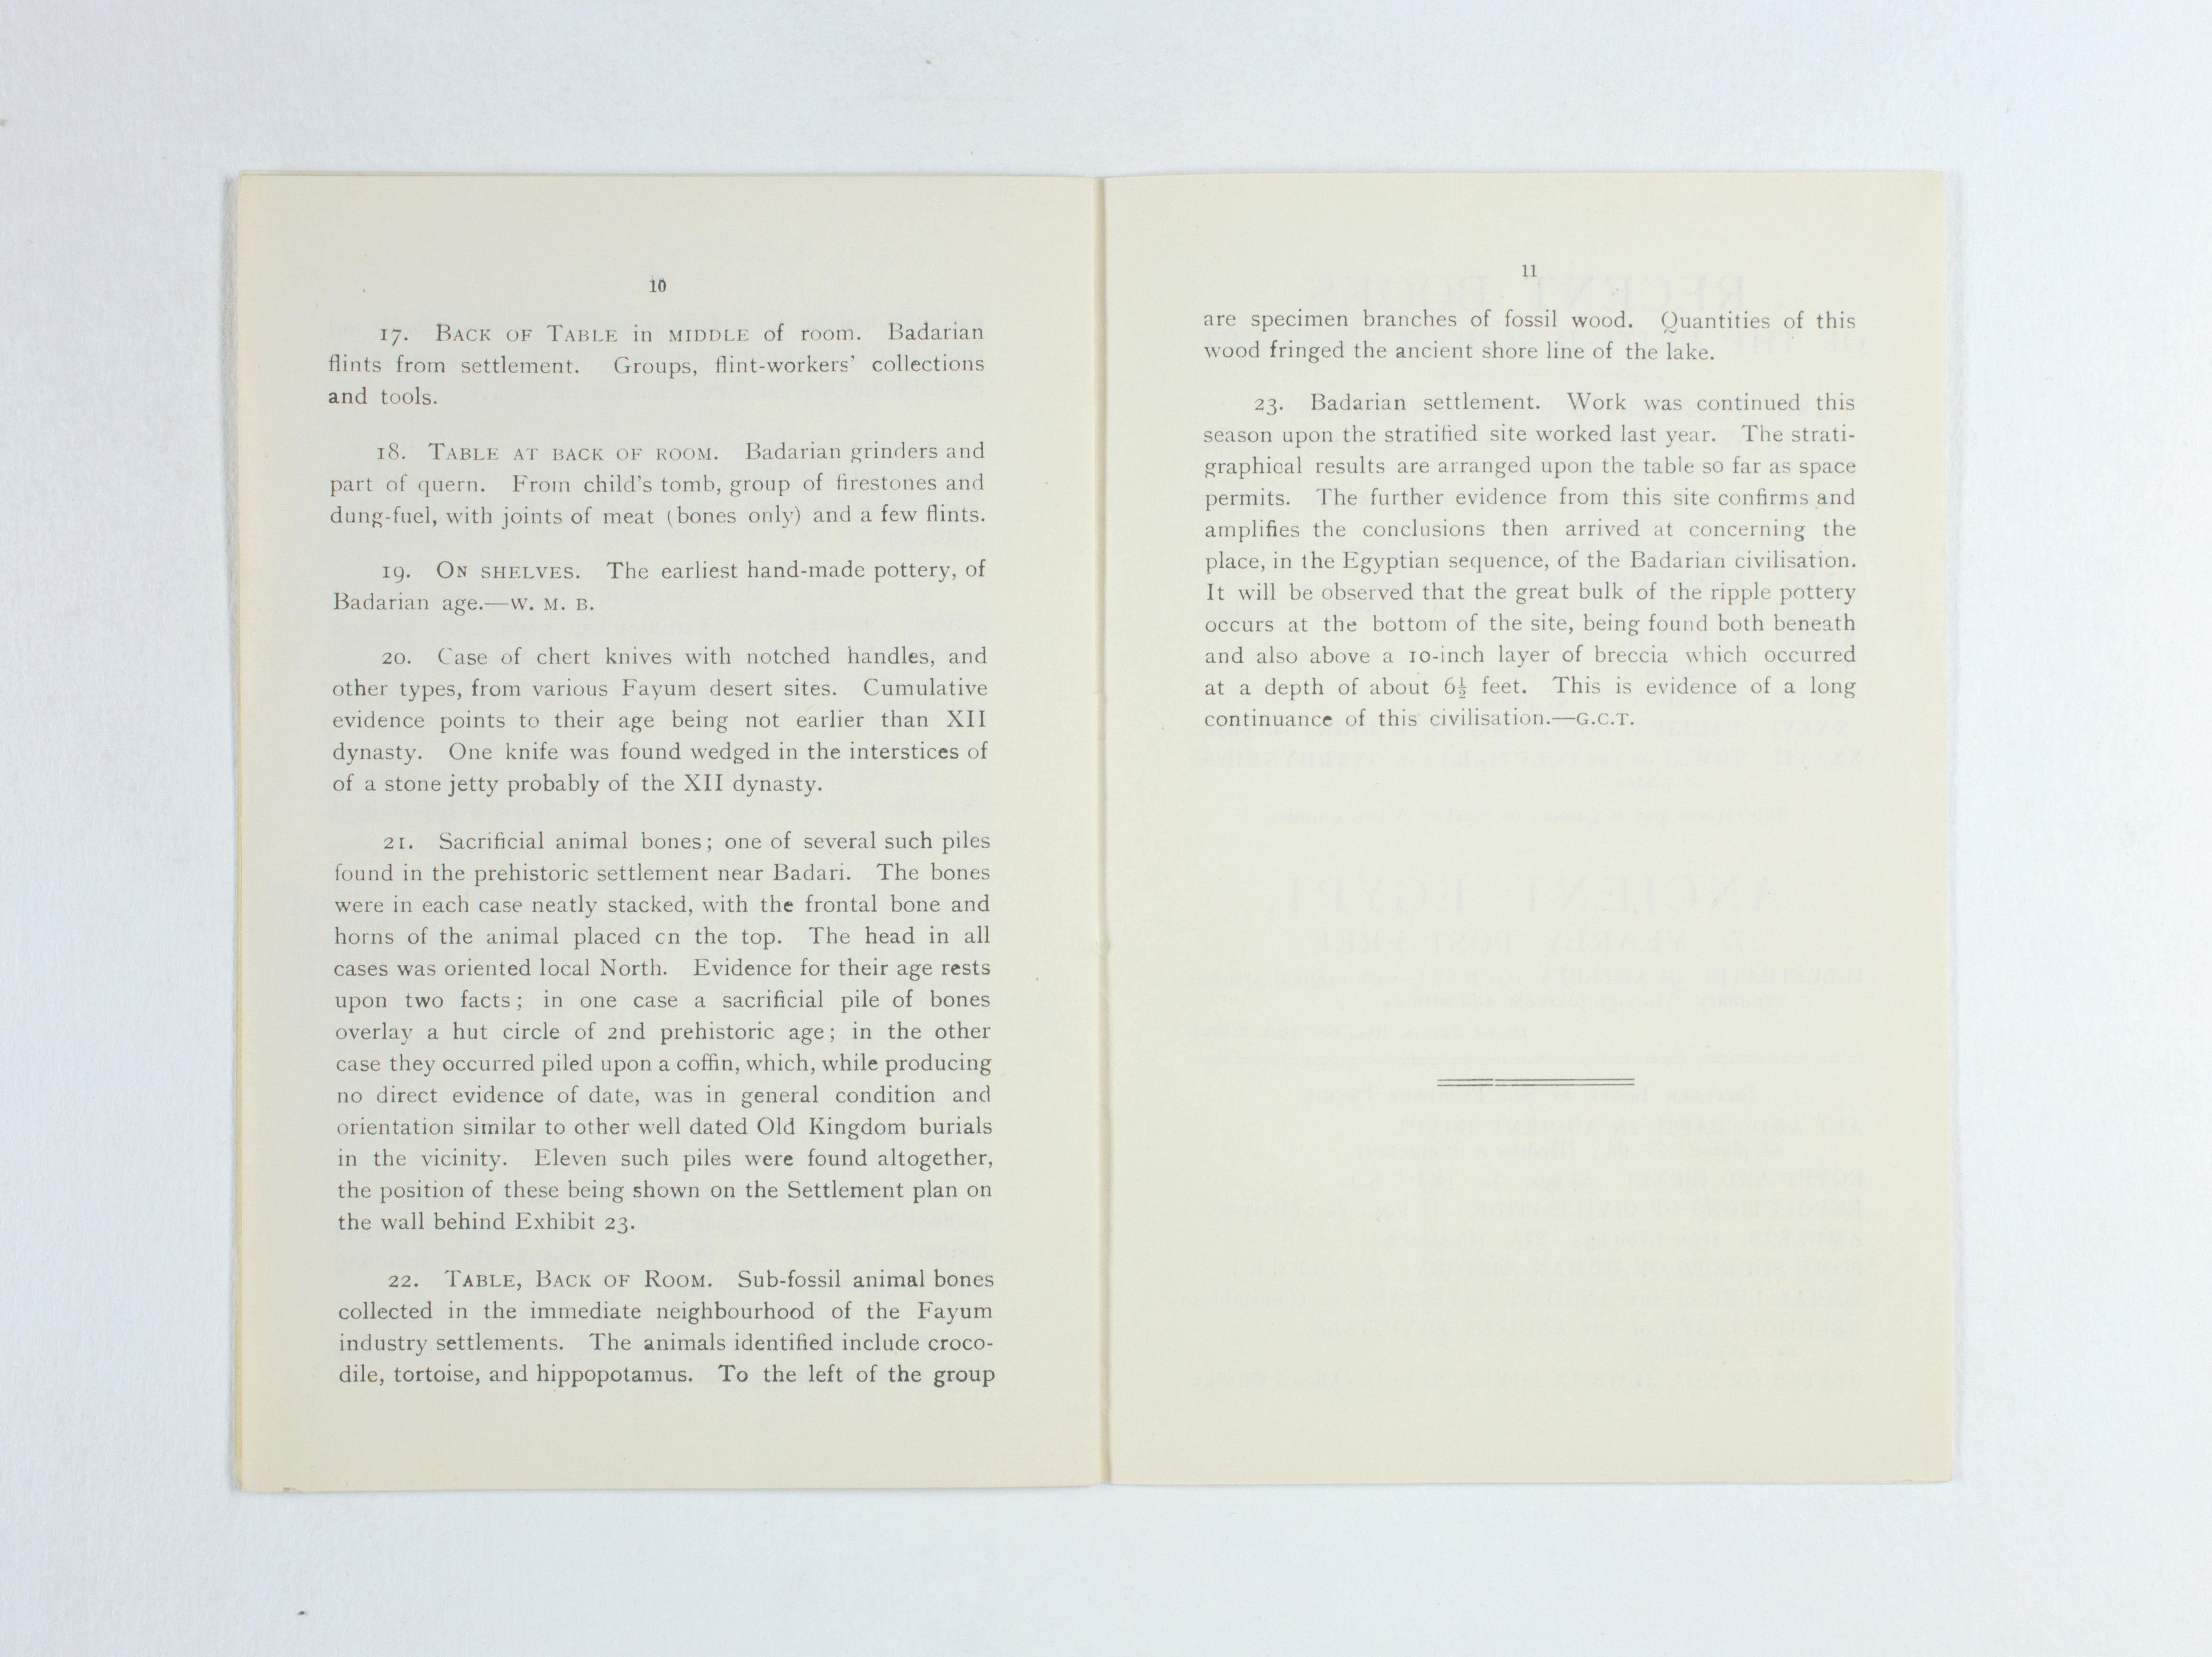 1924-25 Badari, Faiyum Exhibition catalogue PMA/WFP1/D/28/30.8